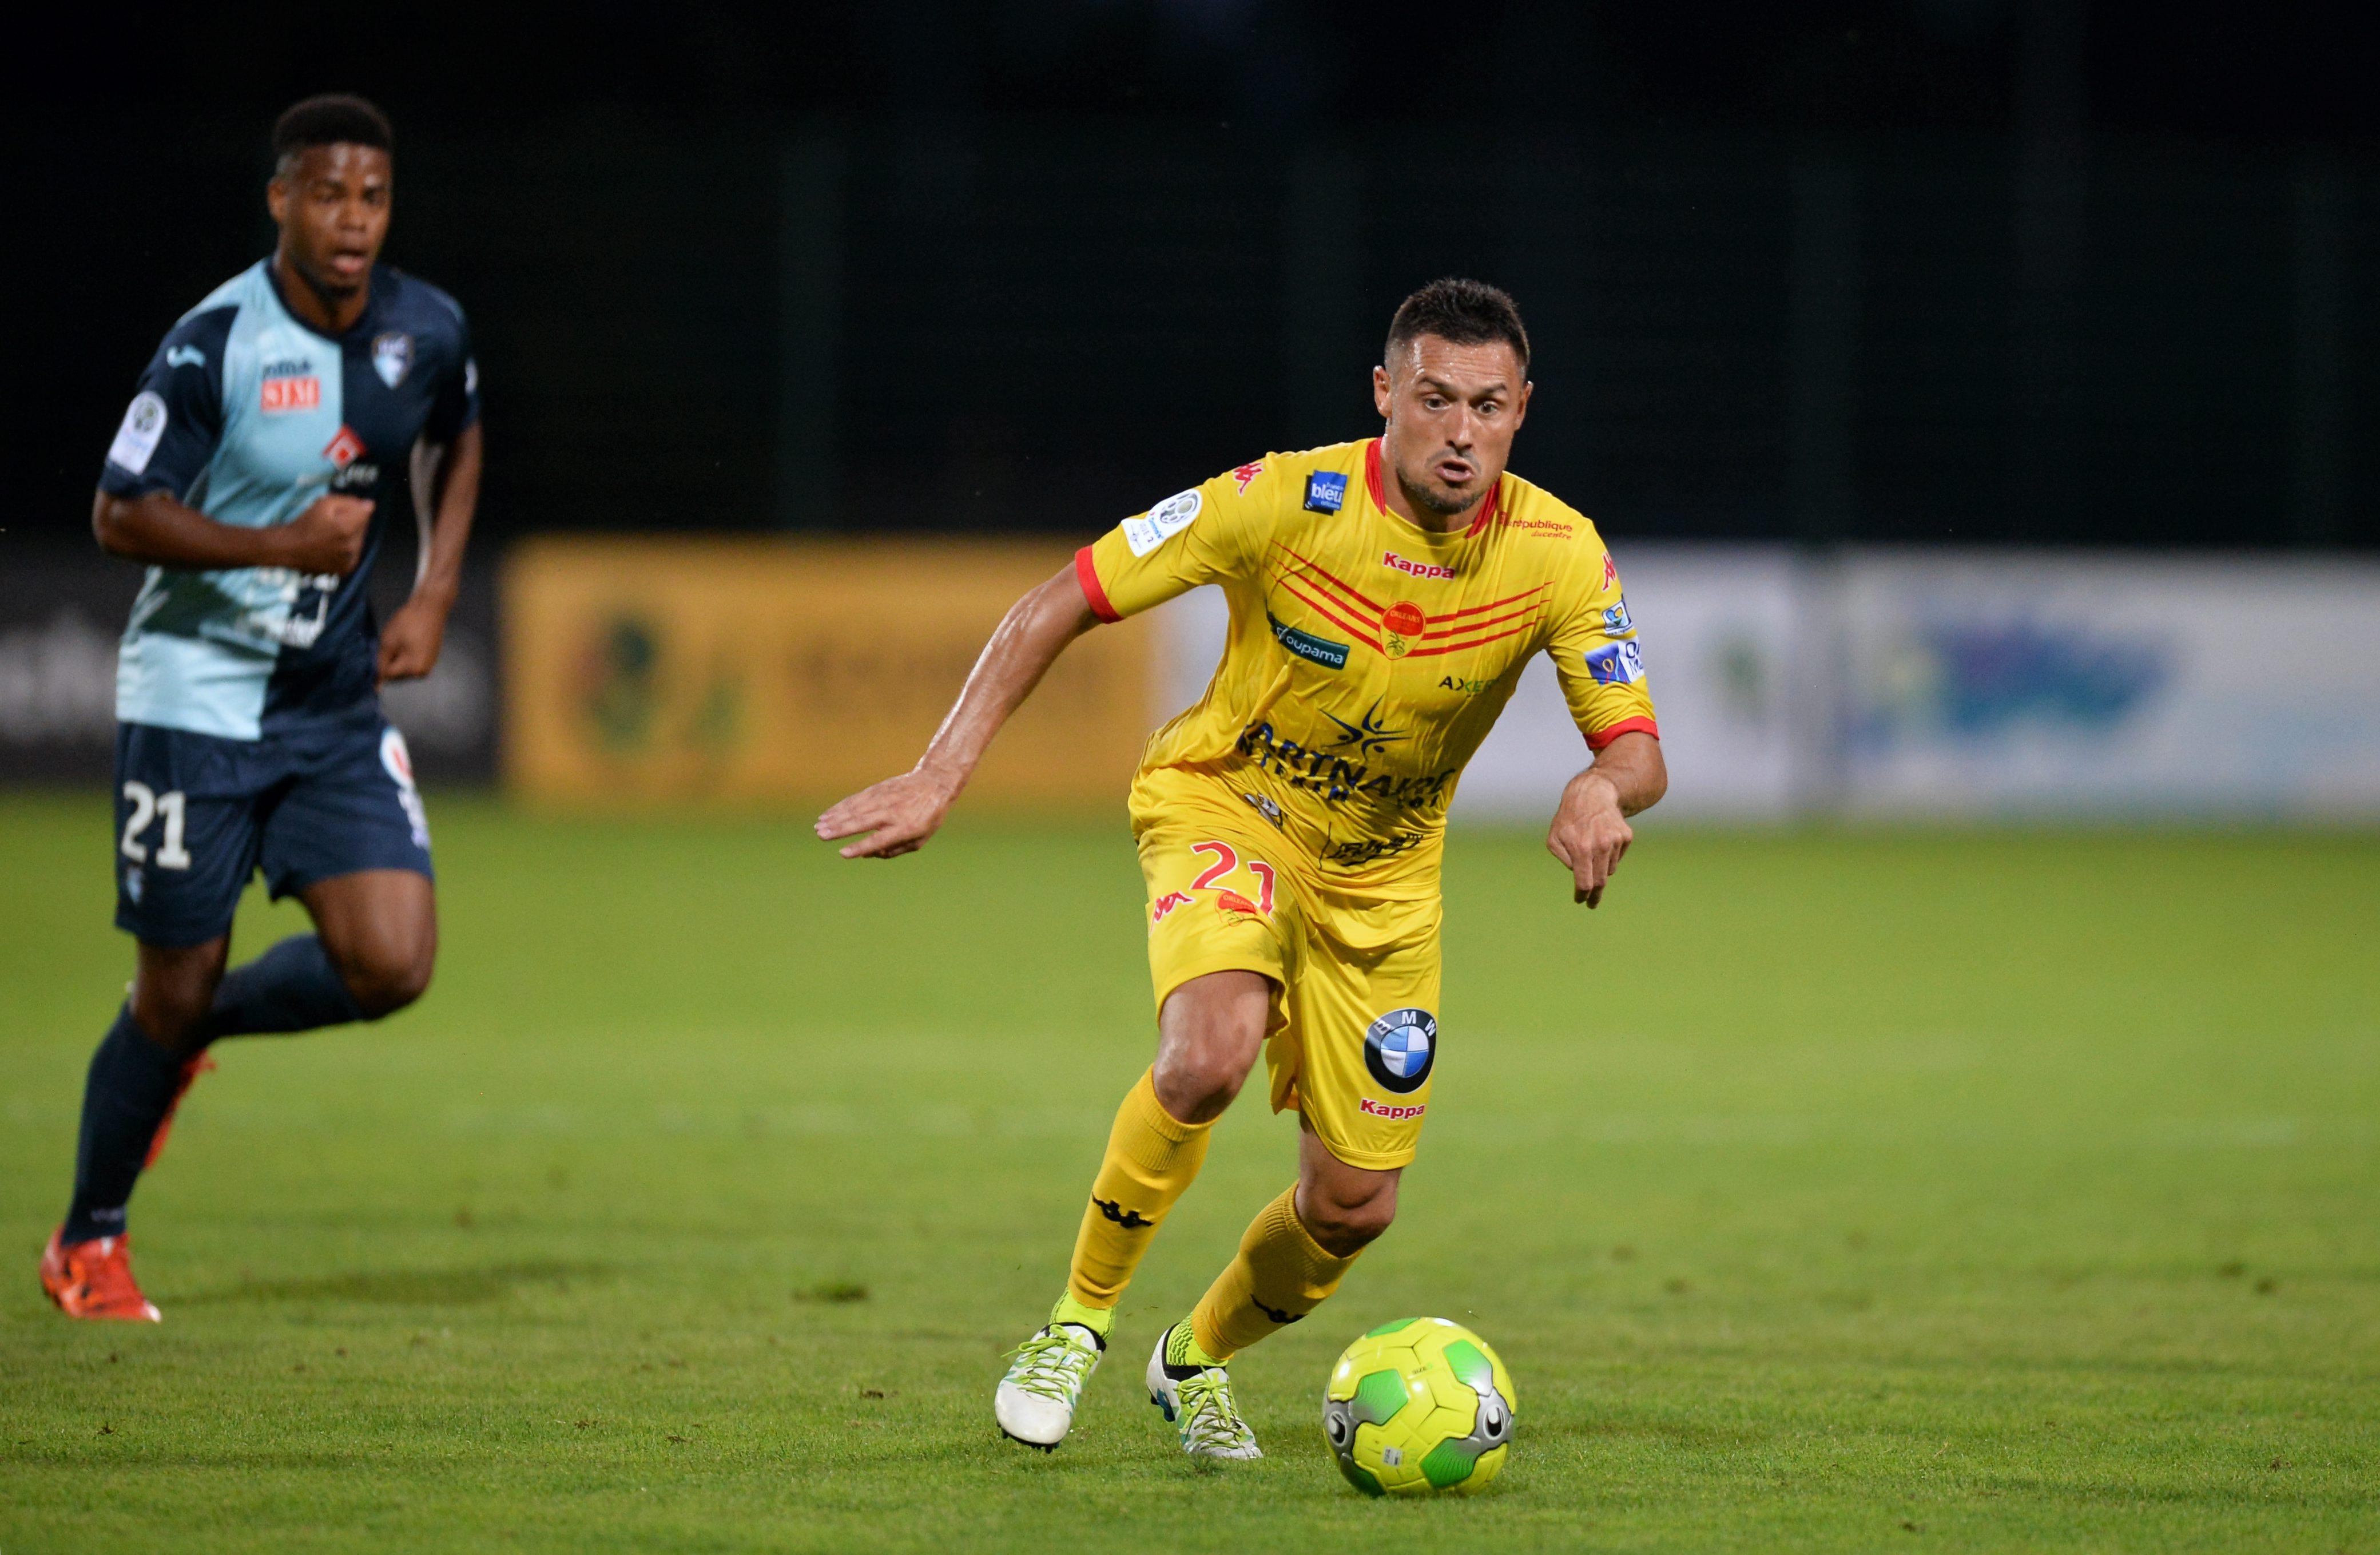 Football - Ligue 2 - Ligue 2: Orléans-Gazélec Ajaccio en direct